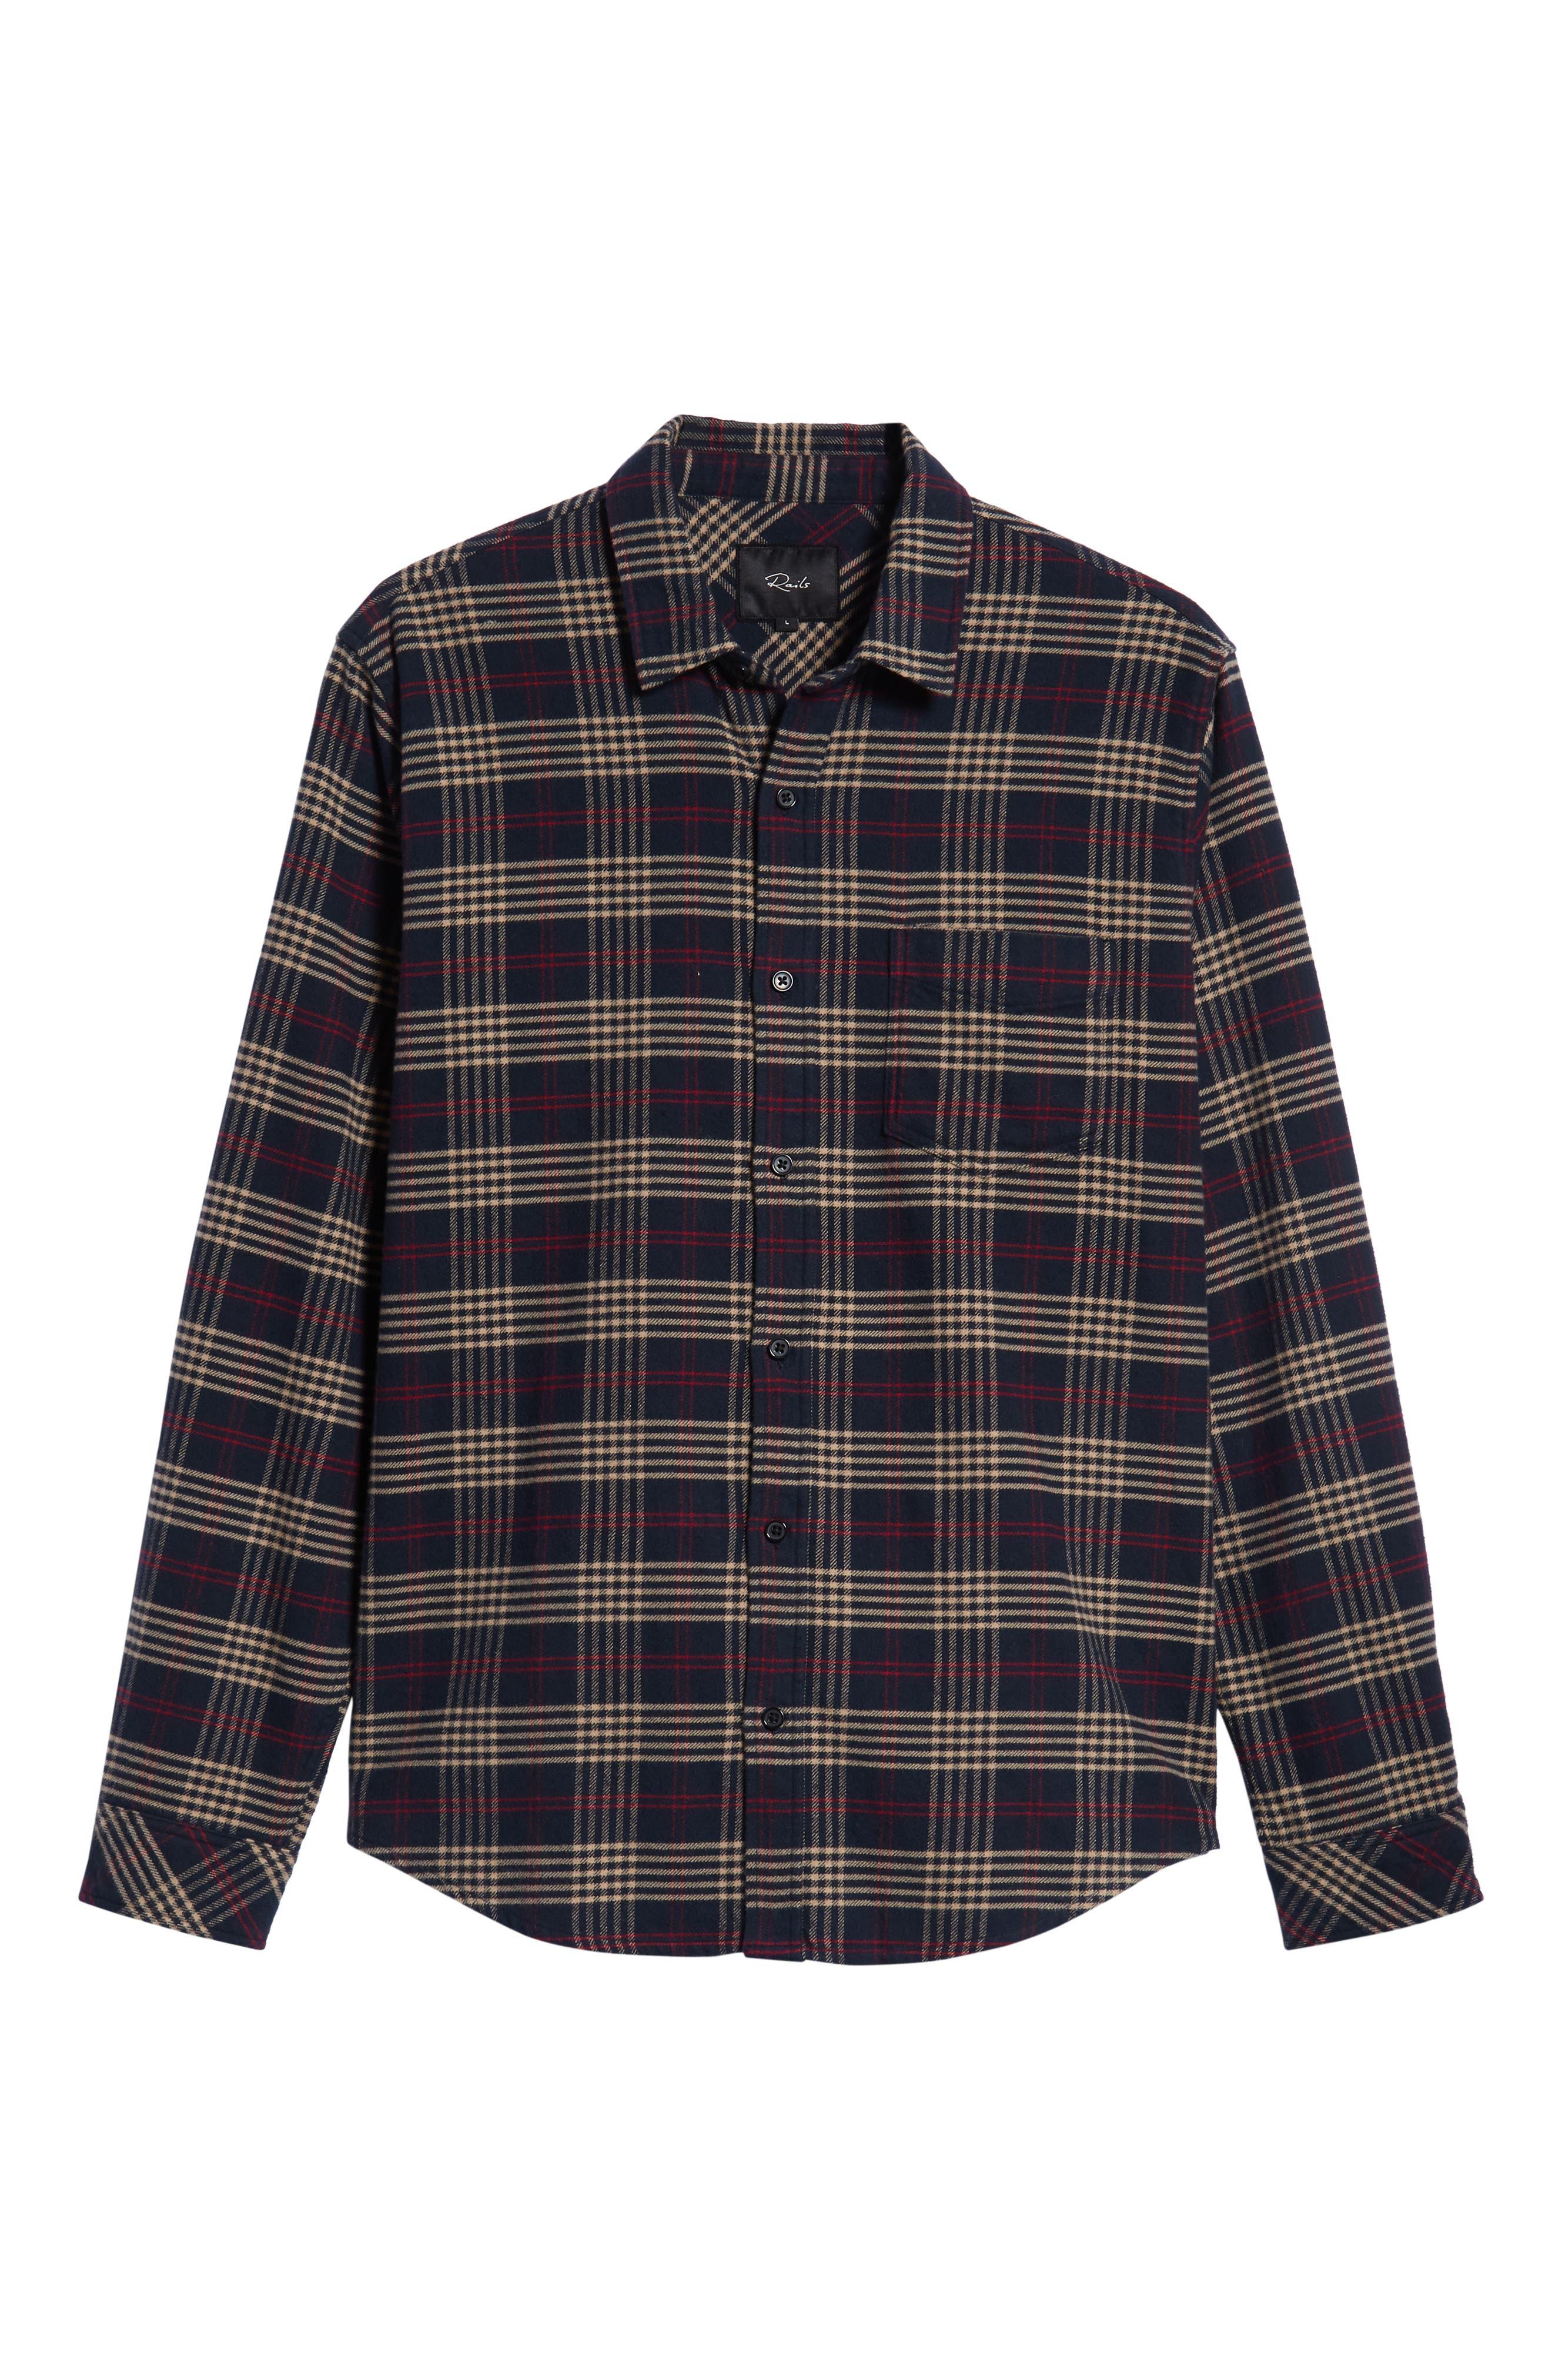 Forrest Slim Fit Plaid Flannel Sport Shirt,                             Alternate thumbnail 5, color,                             NAVY/RED/ELM